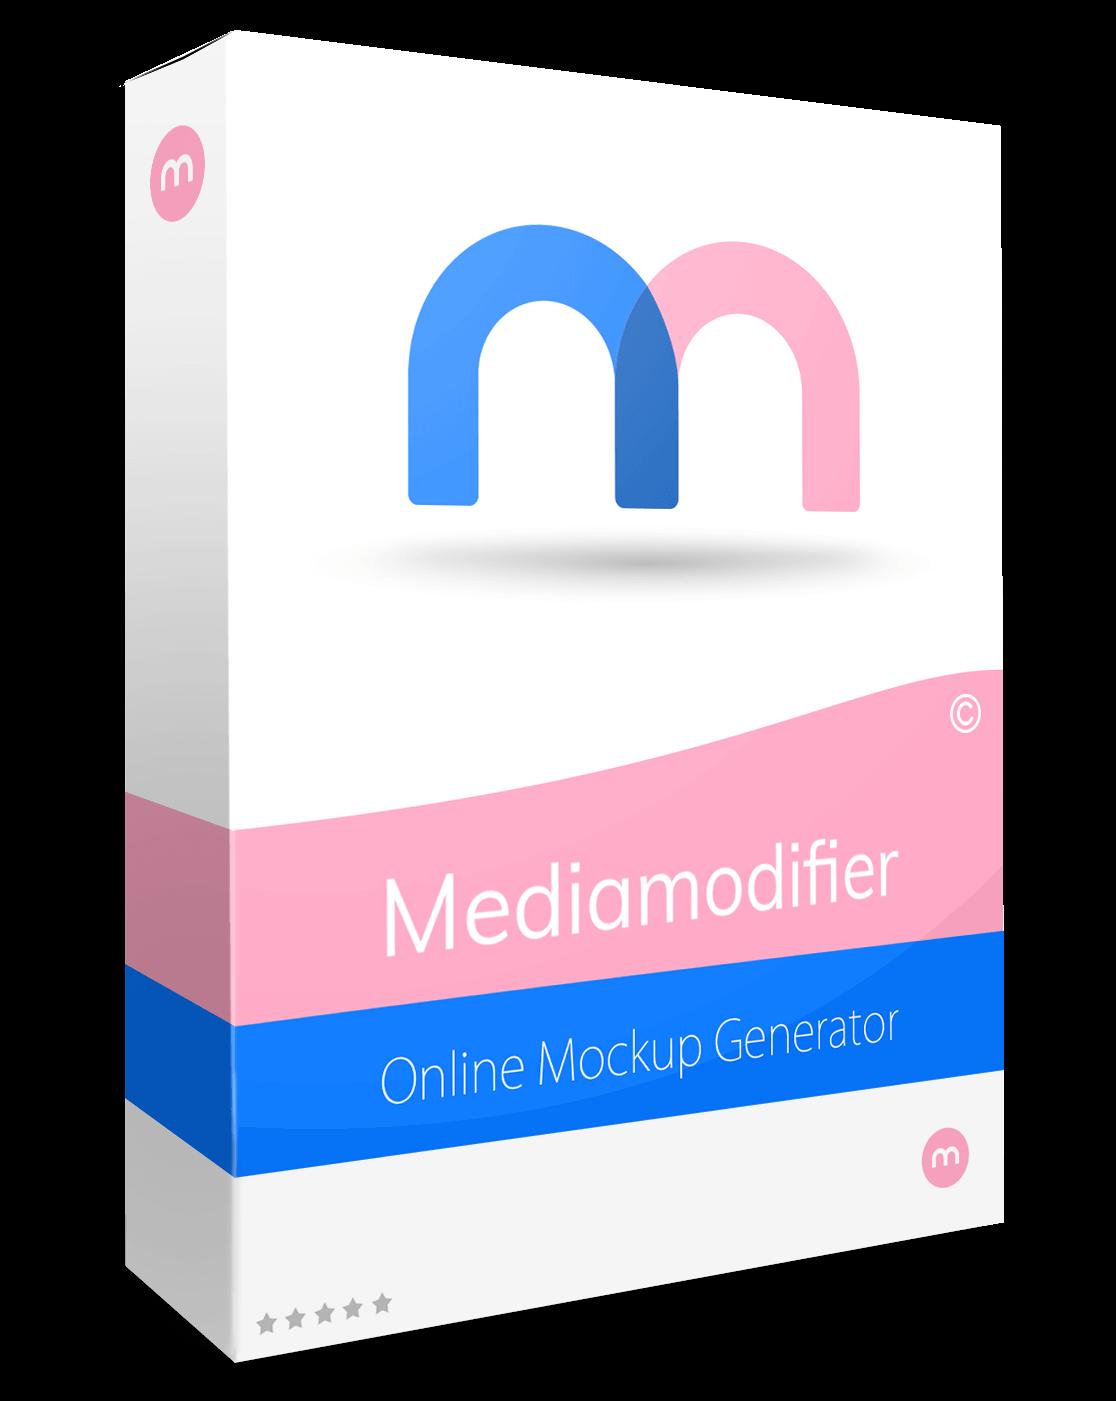 Mediamodifier